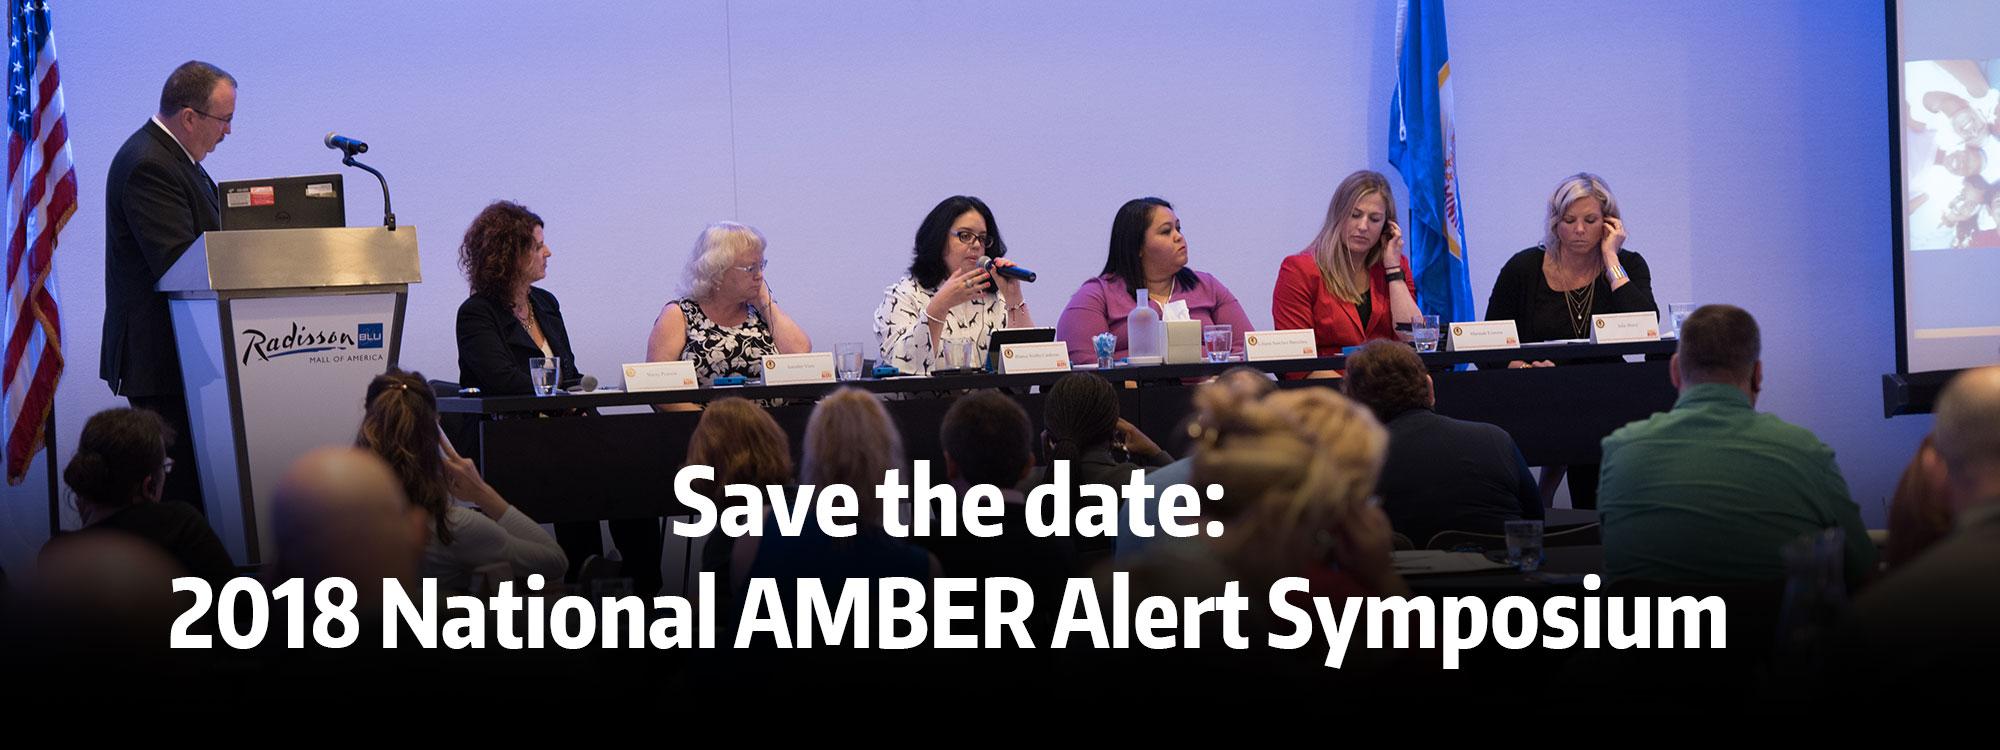 2018 AMBER Alert Symposium Save the Date